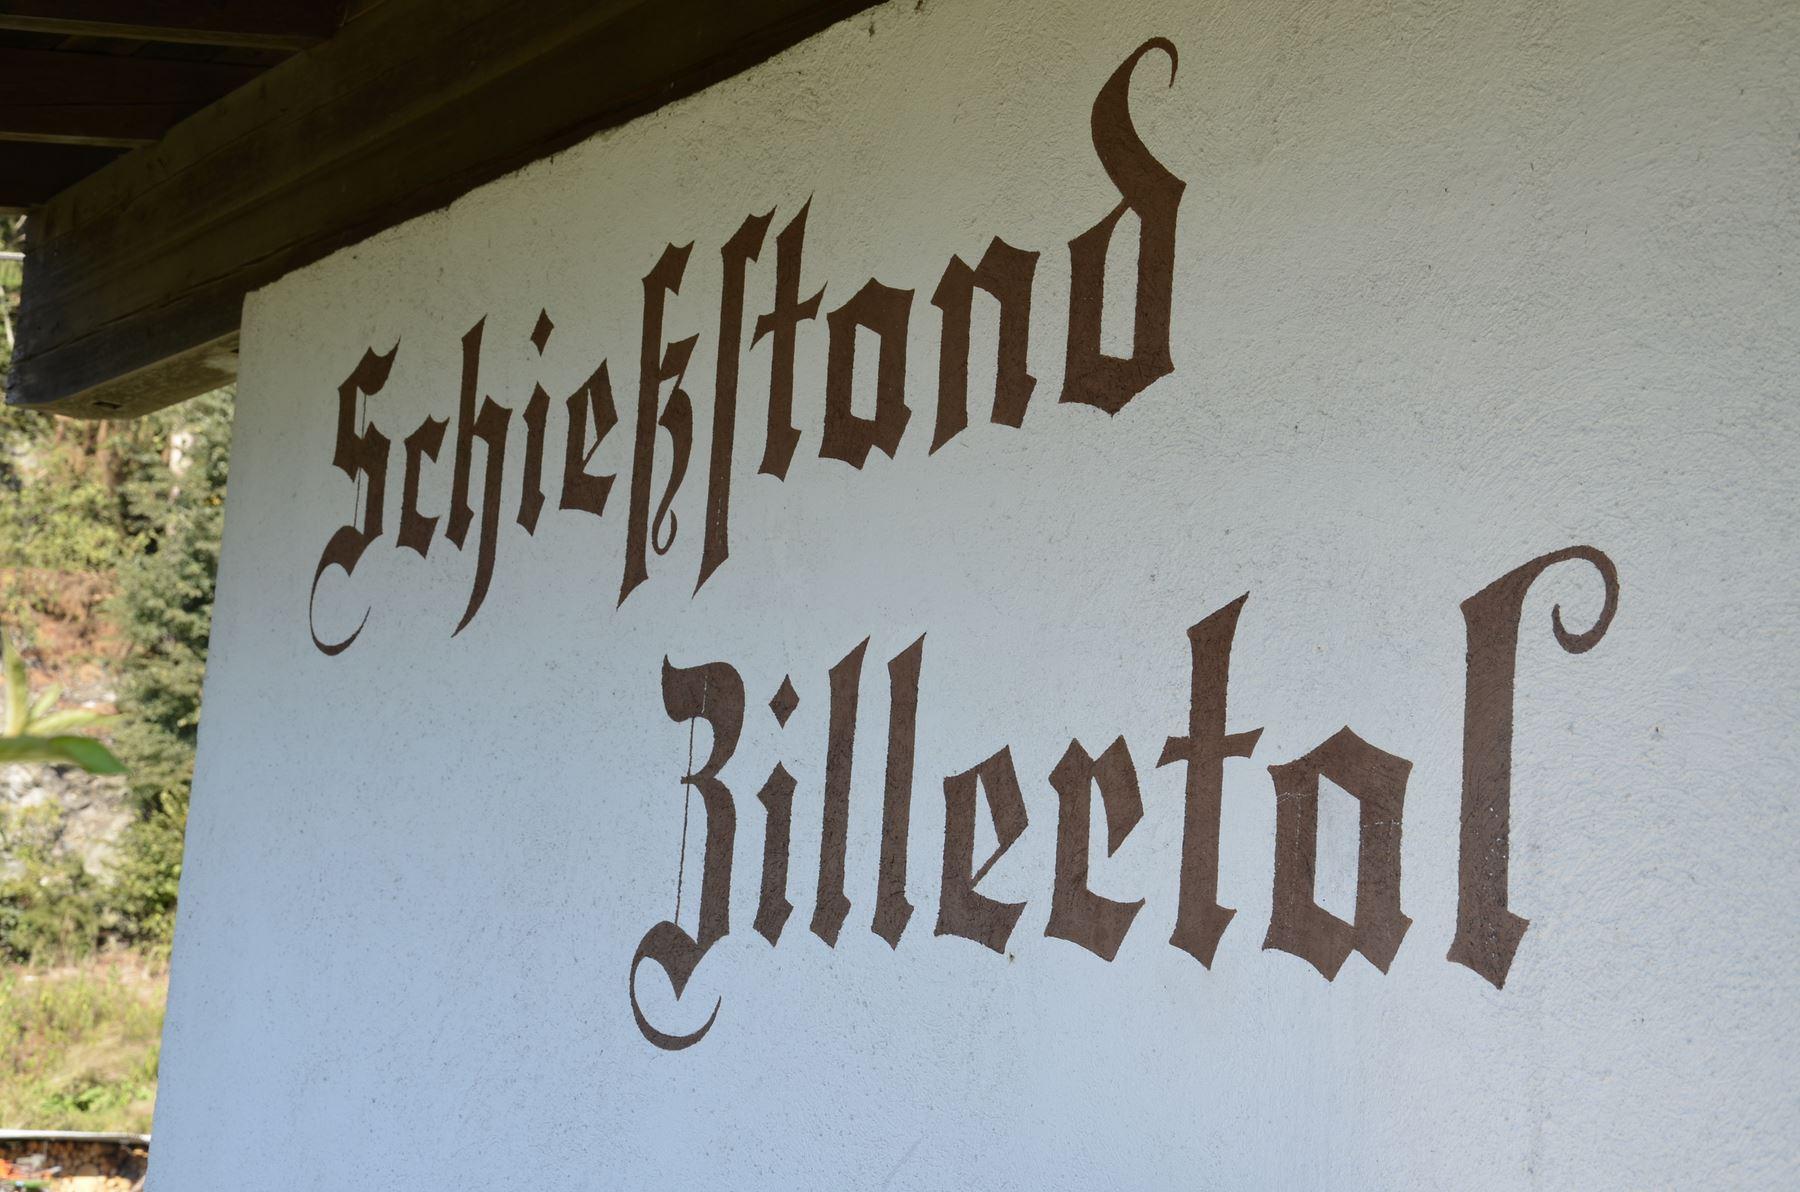 2015-08-29 KK-Schießen BV Zillertal 022